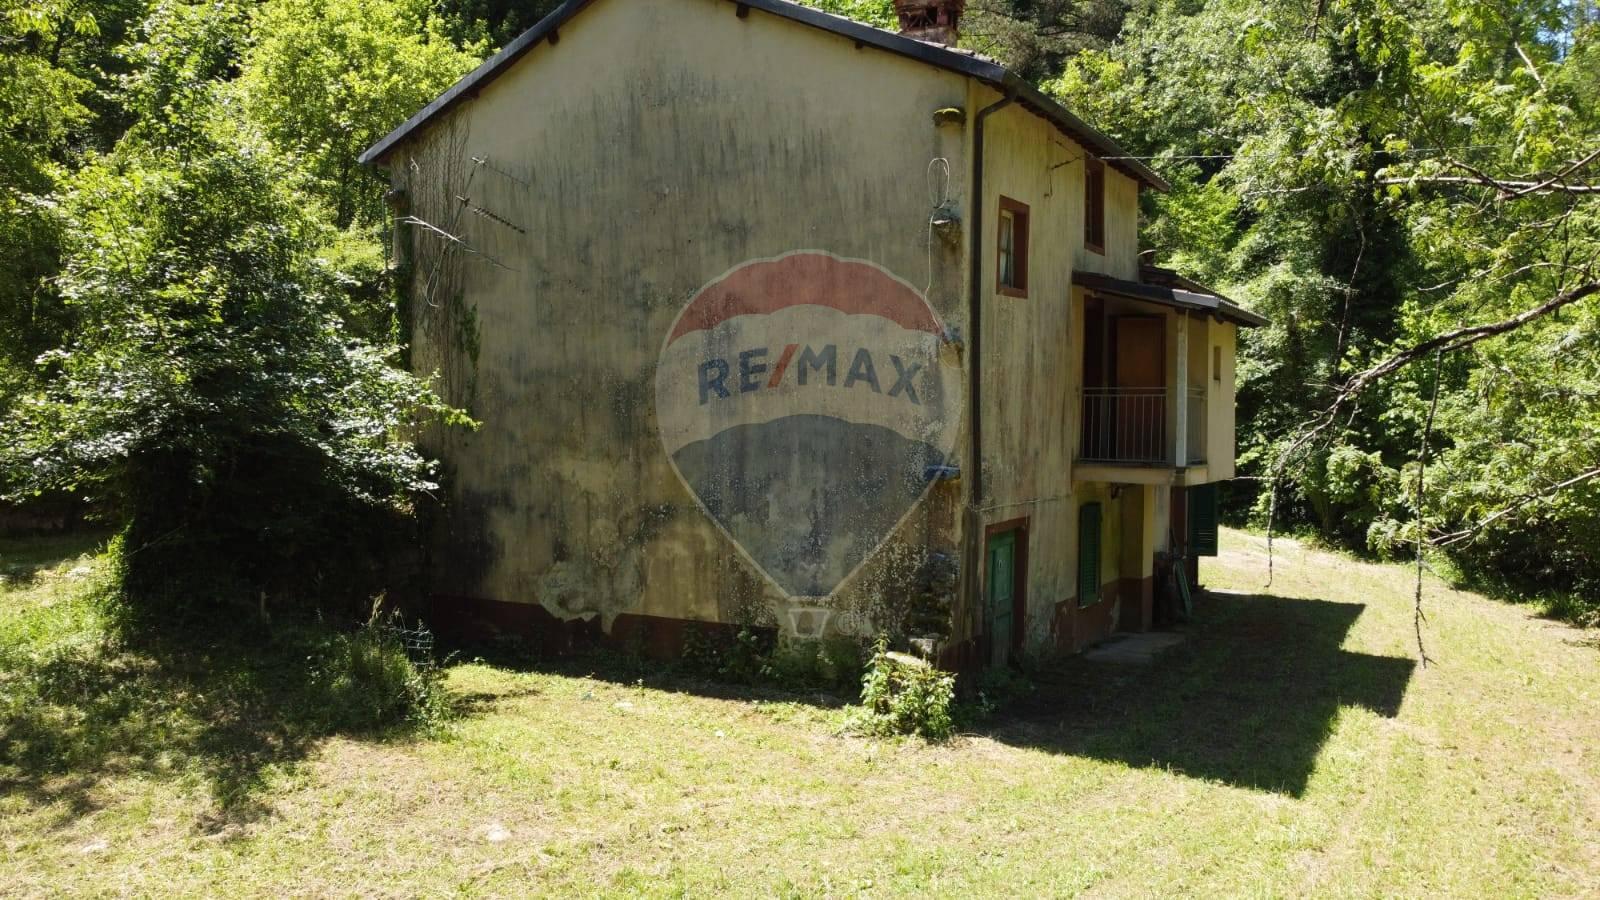 CASA INDIPENDENTE in VENDITA a GALLICANO